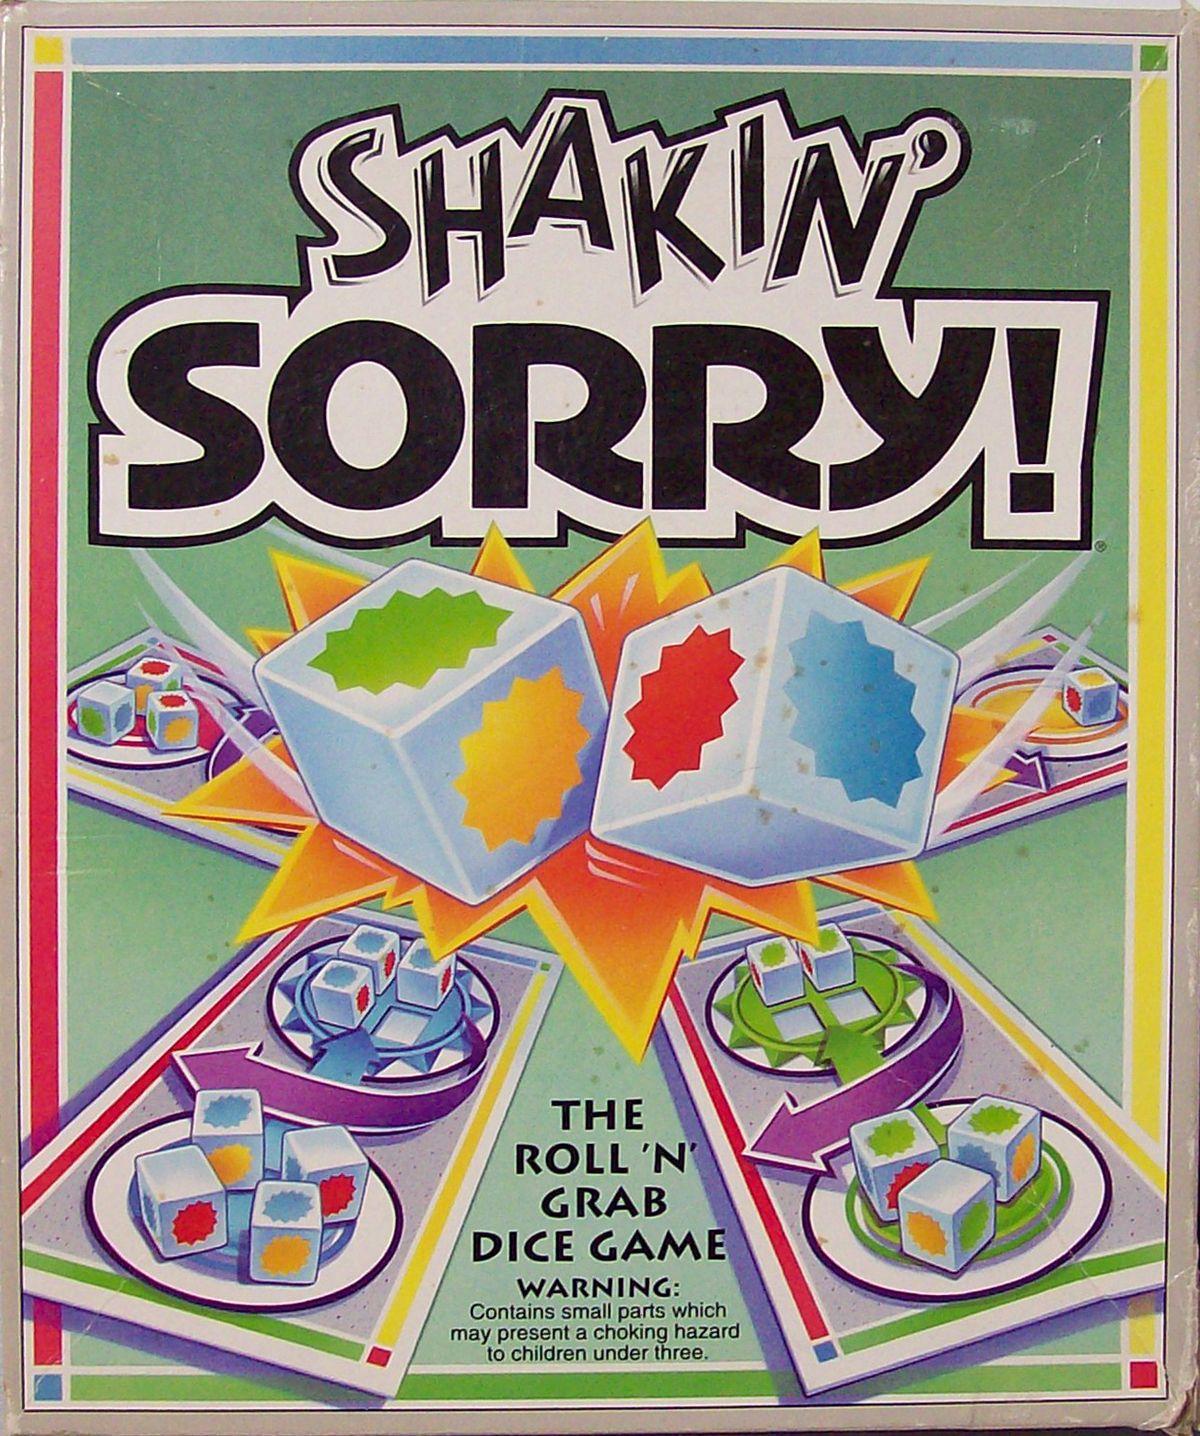 Shakin' Sorry